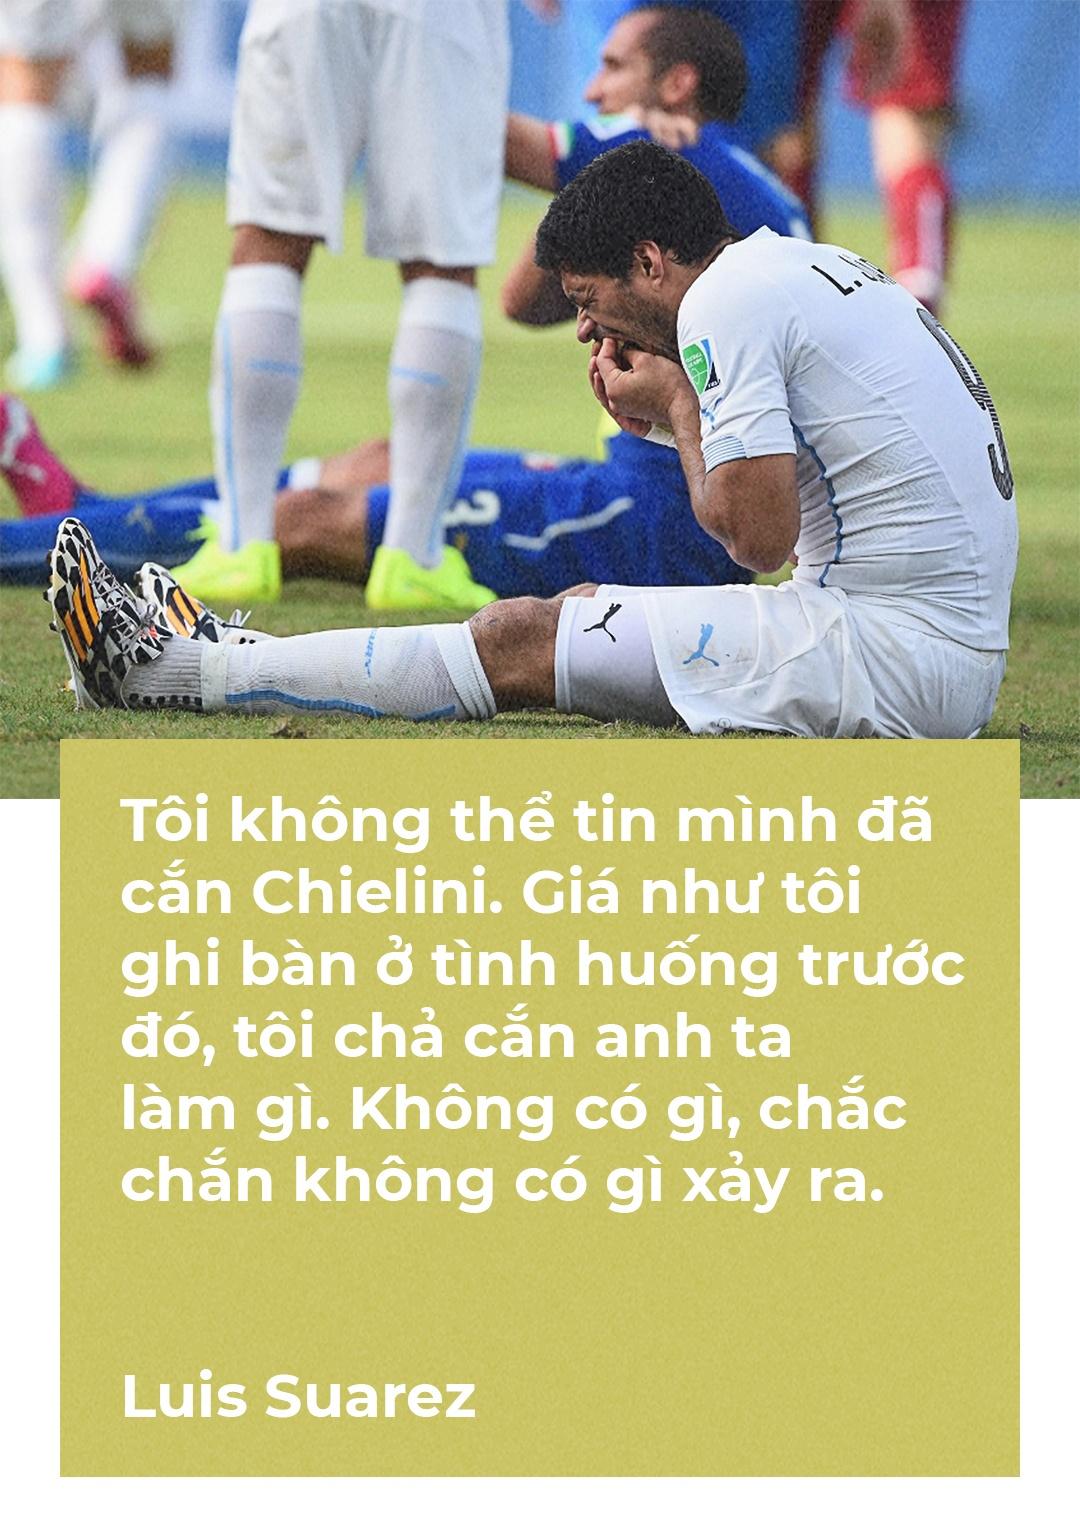 Bo mat nao cho Luis Suarez o World Cup 2018 anh 6